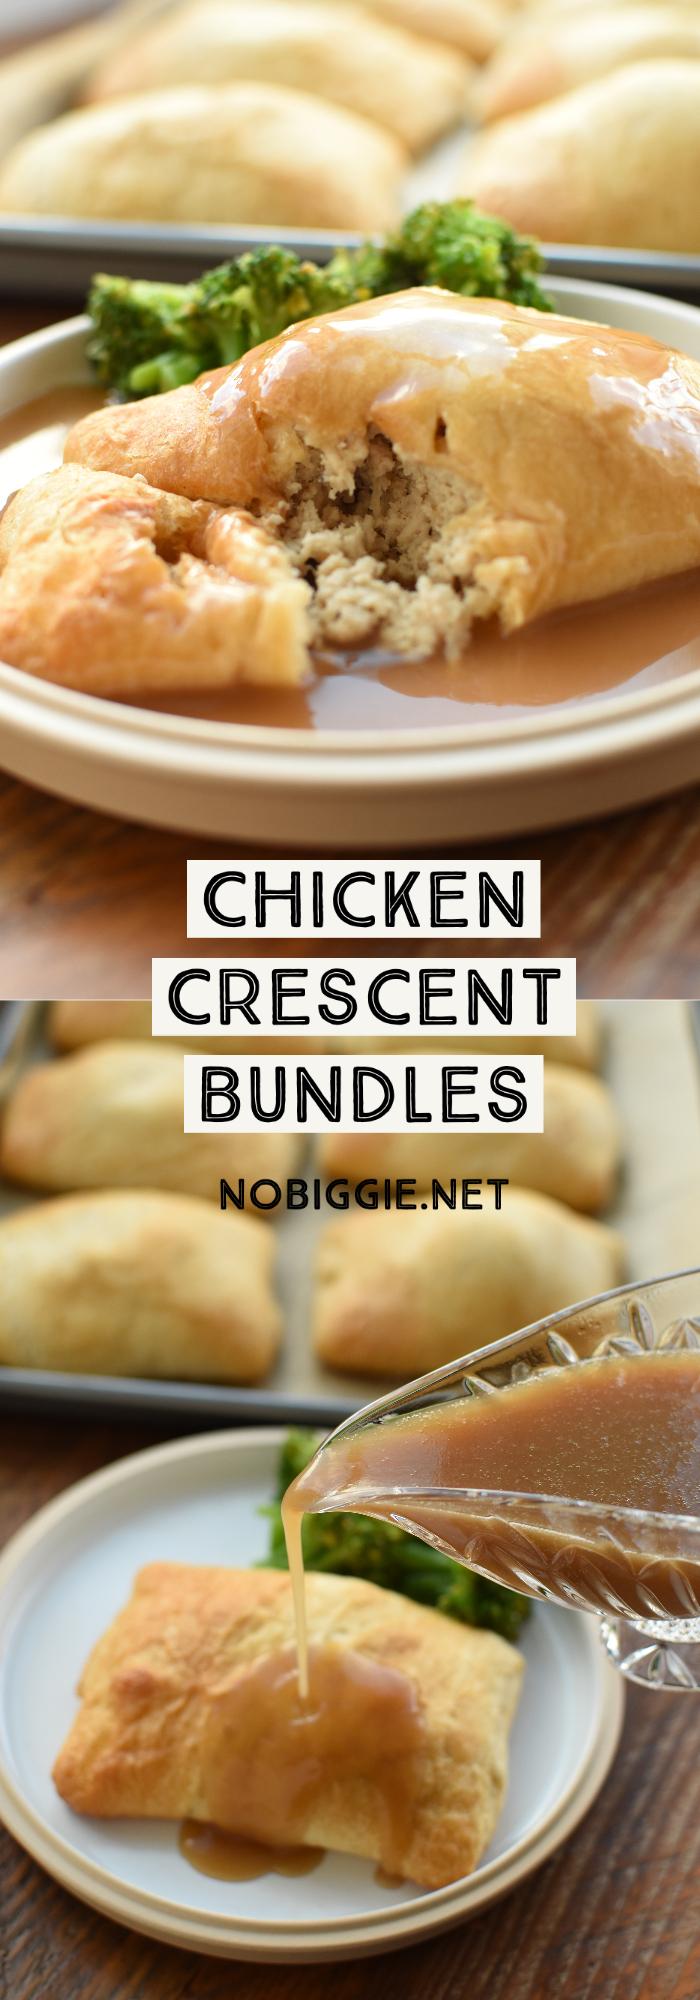 chicken crescent bundles | NoBiggie.net